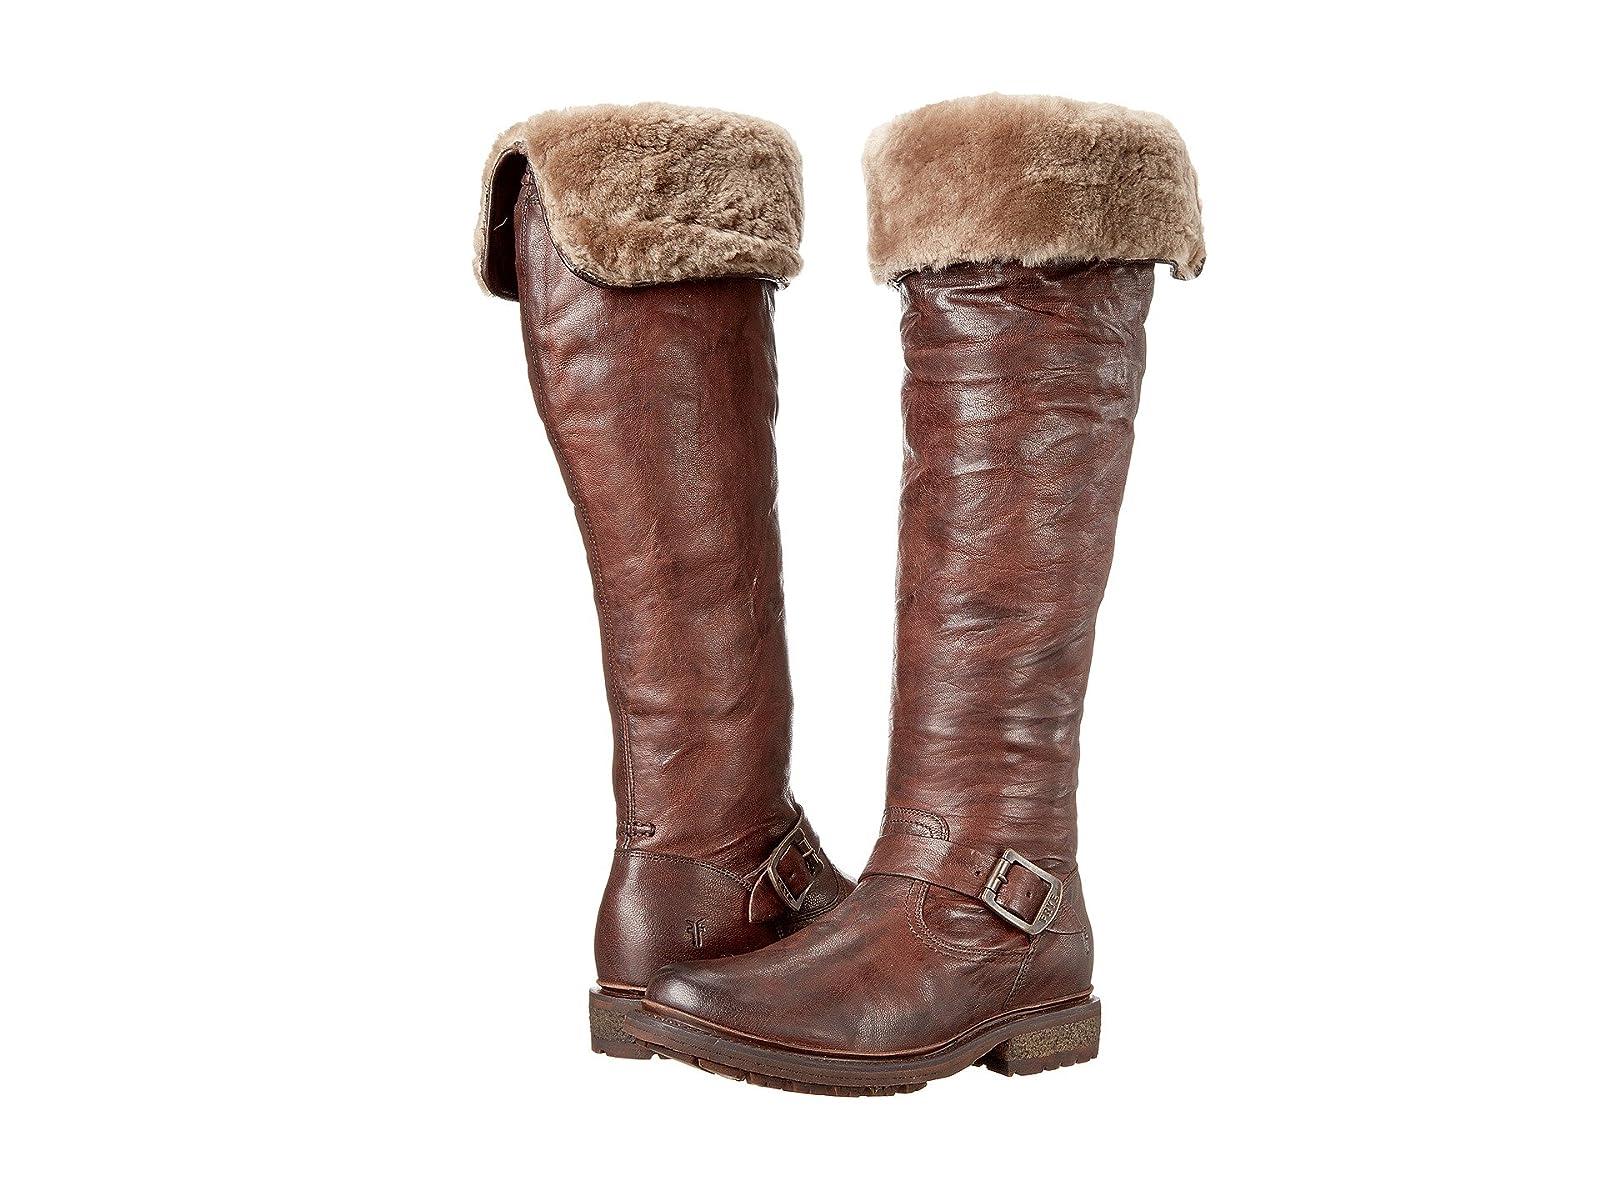 Frye Valerie OTKCheap and distinctive eye-catching shoes